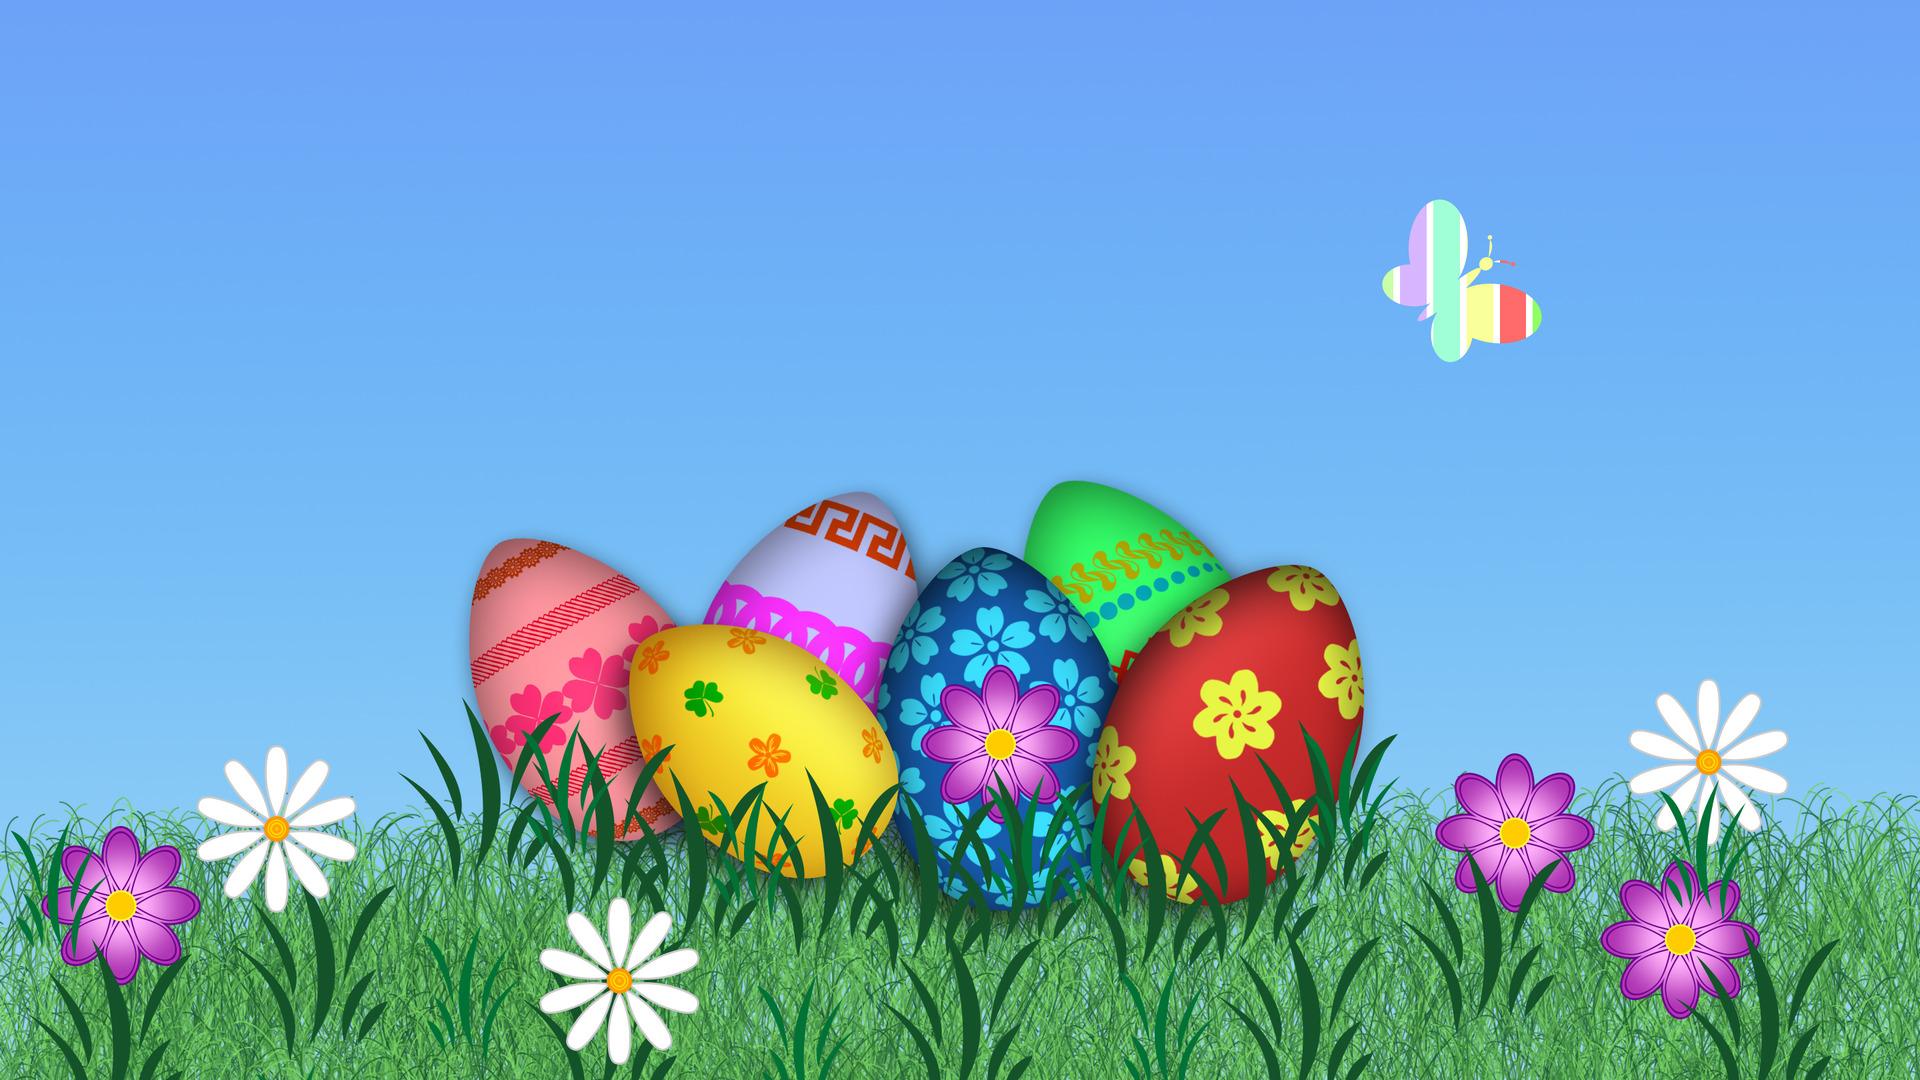 Happy Easter wallpaper 29667 1920x1080